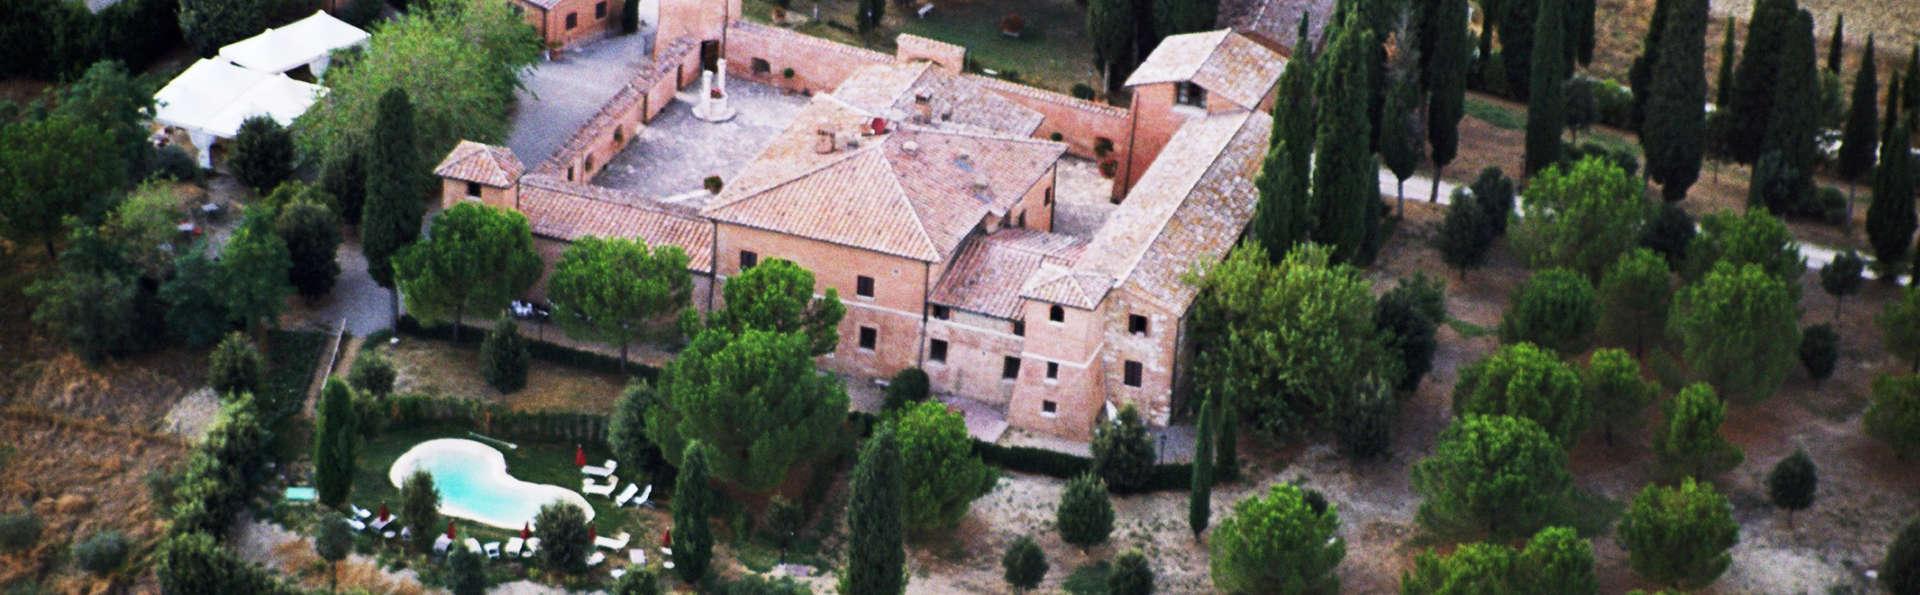 Castello di Leonina Relais - edit_aerea1.jpg